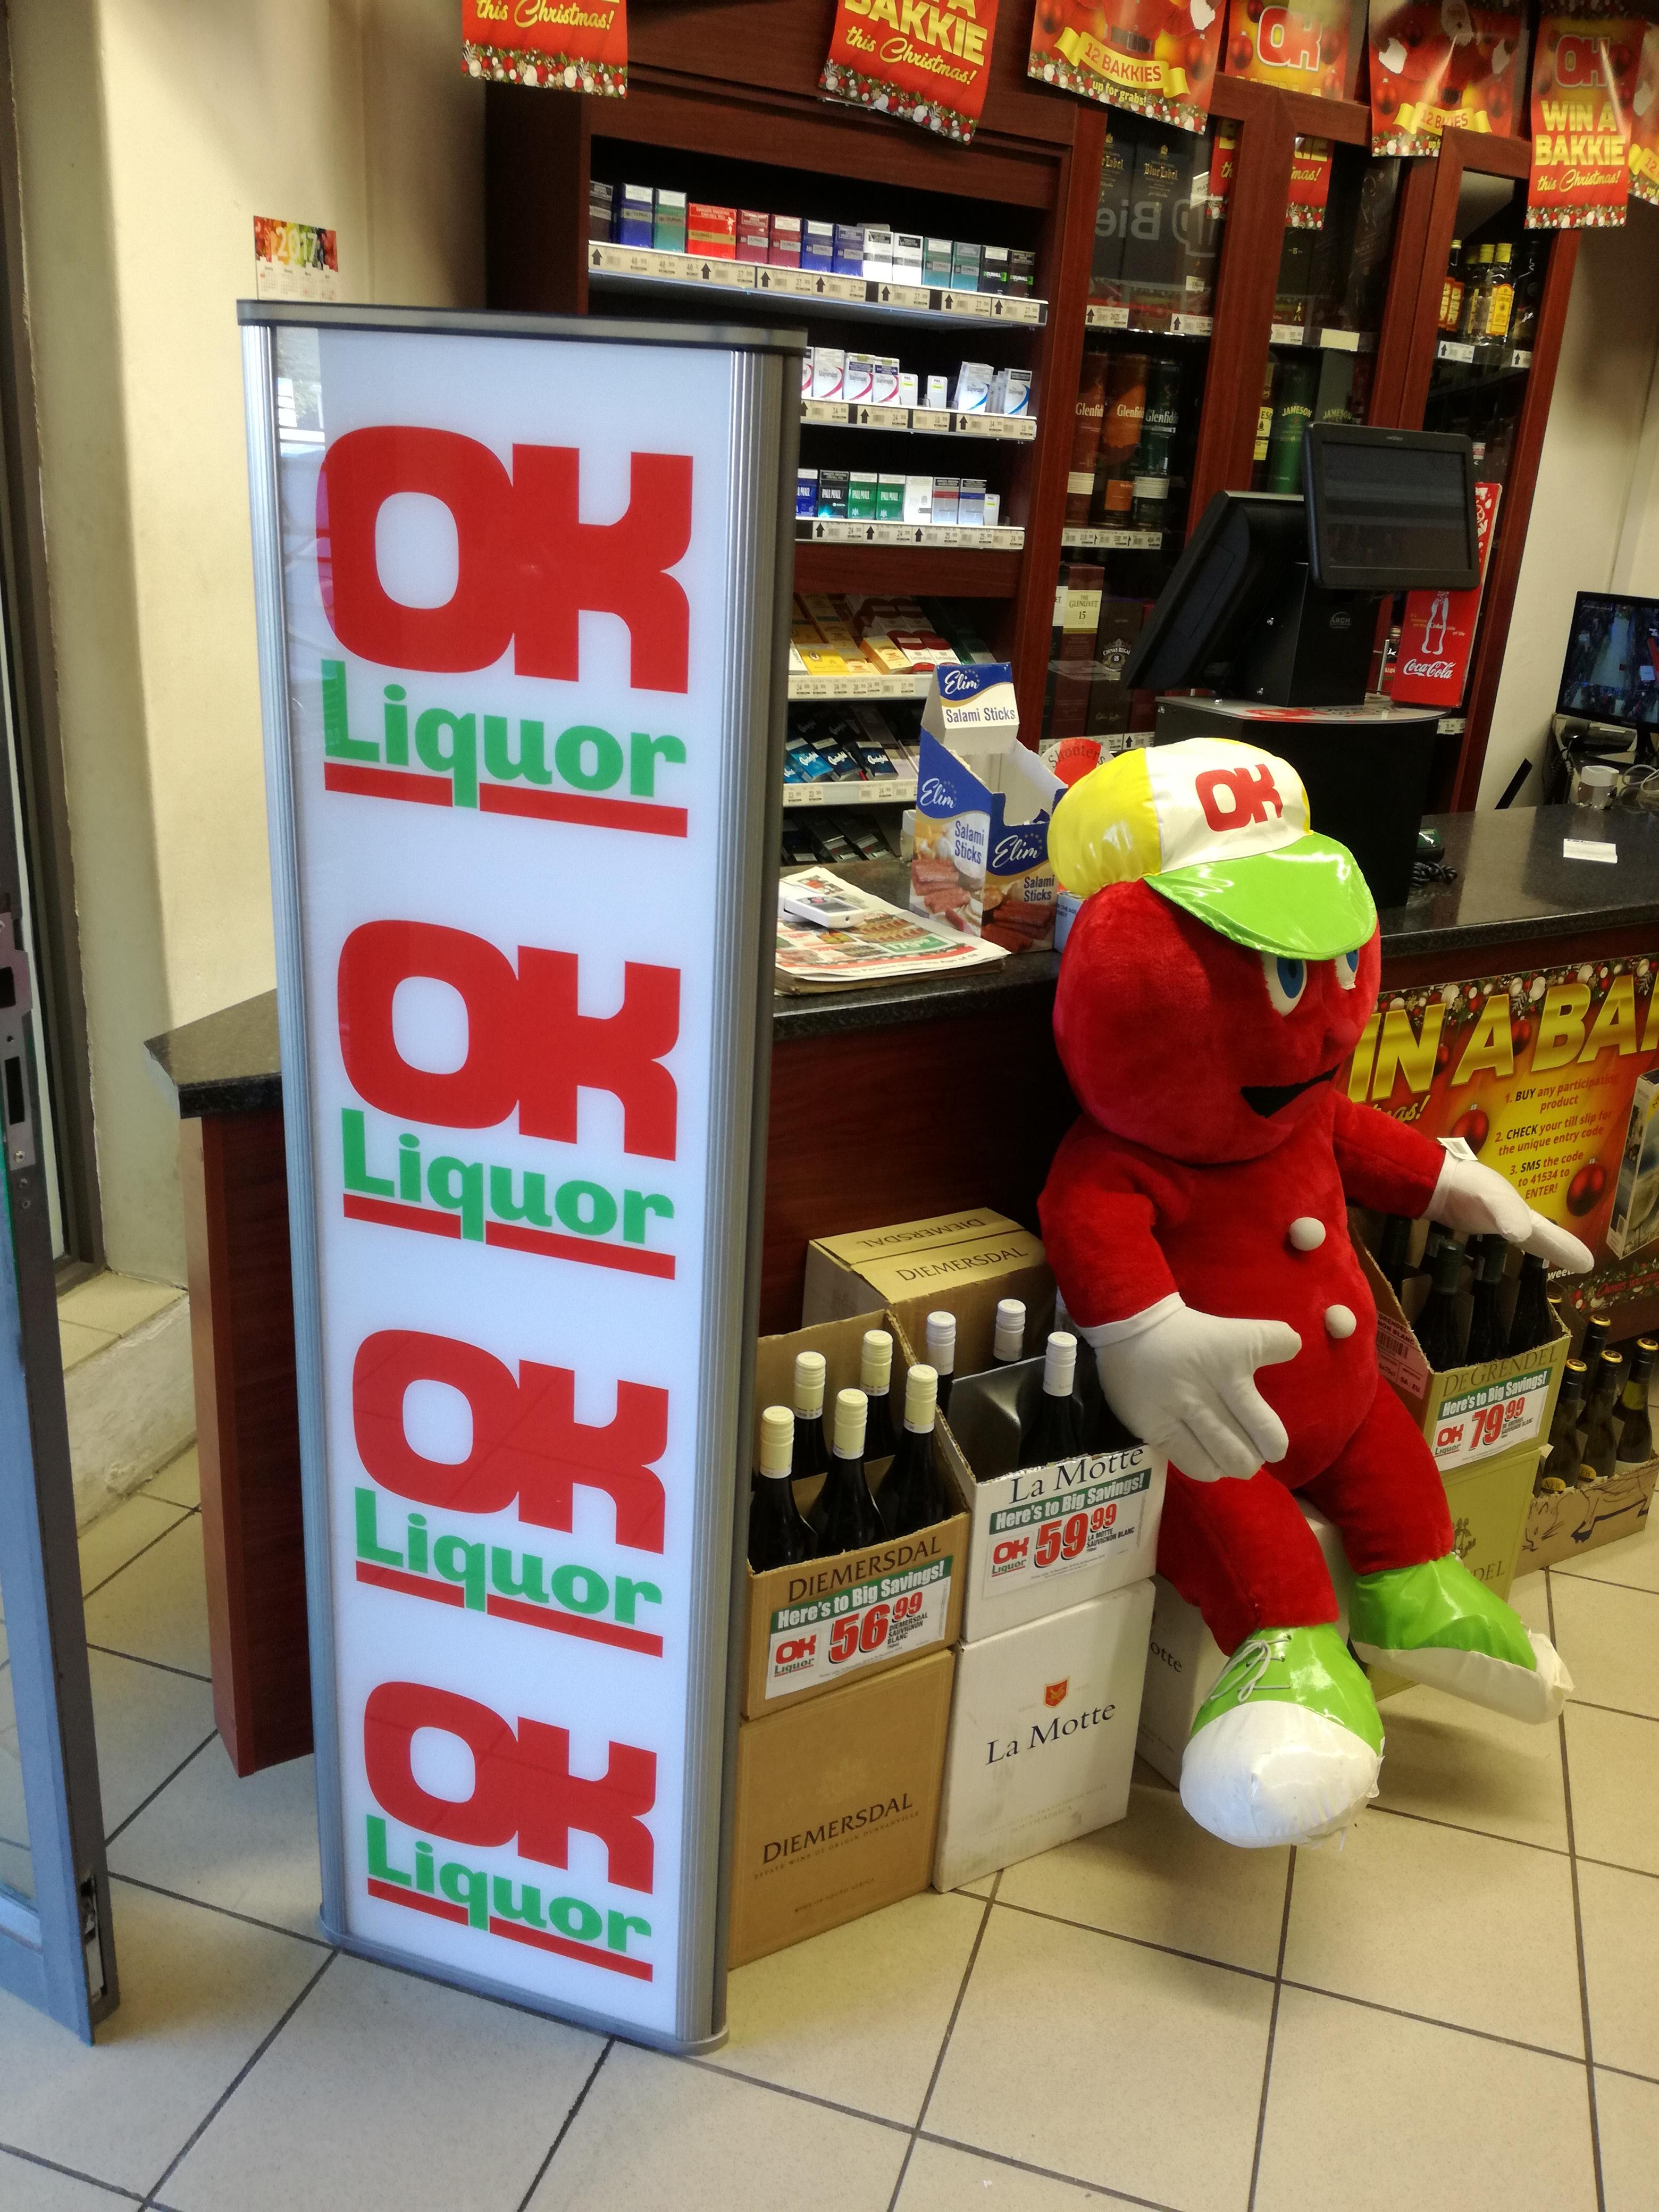 Tagtron - OK Liquor Store